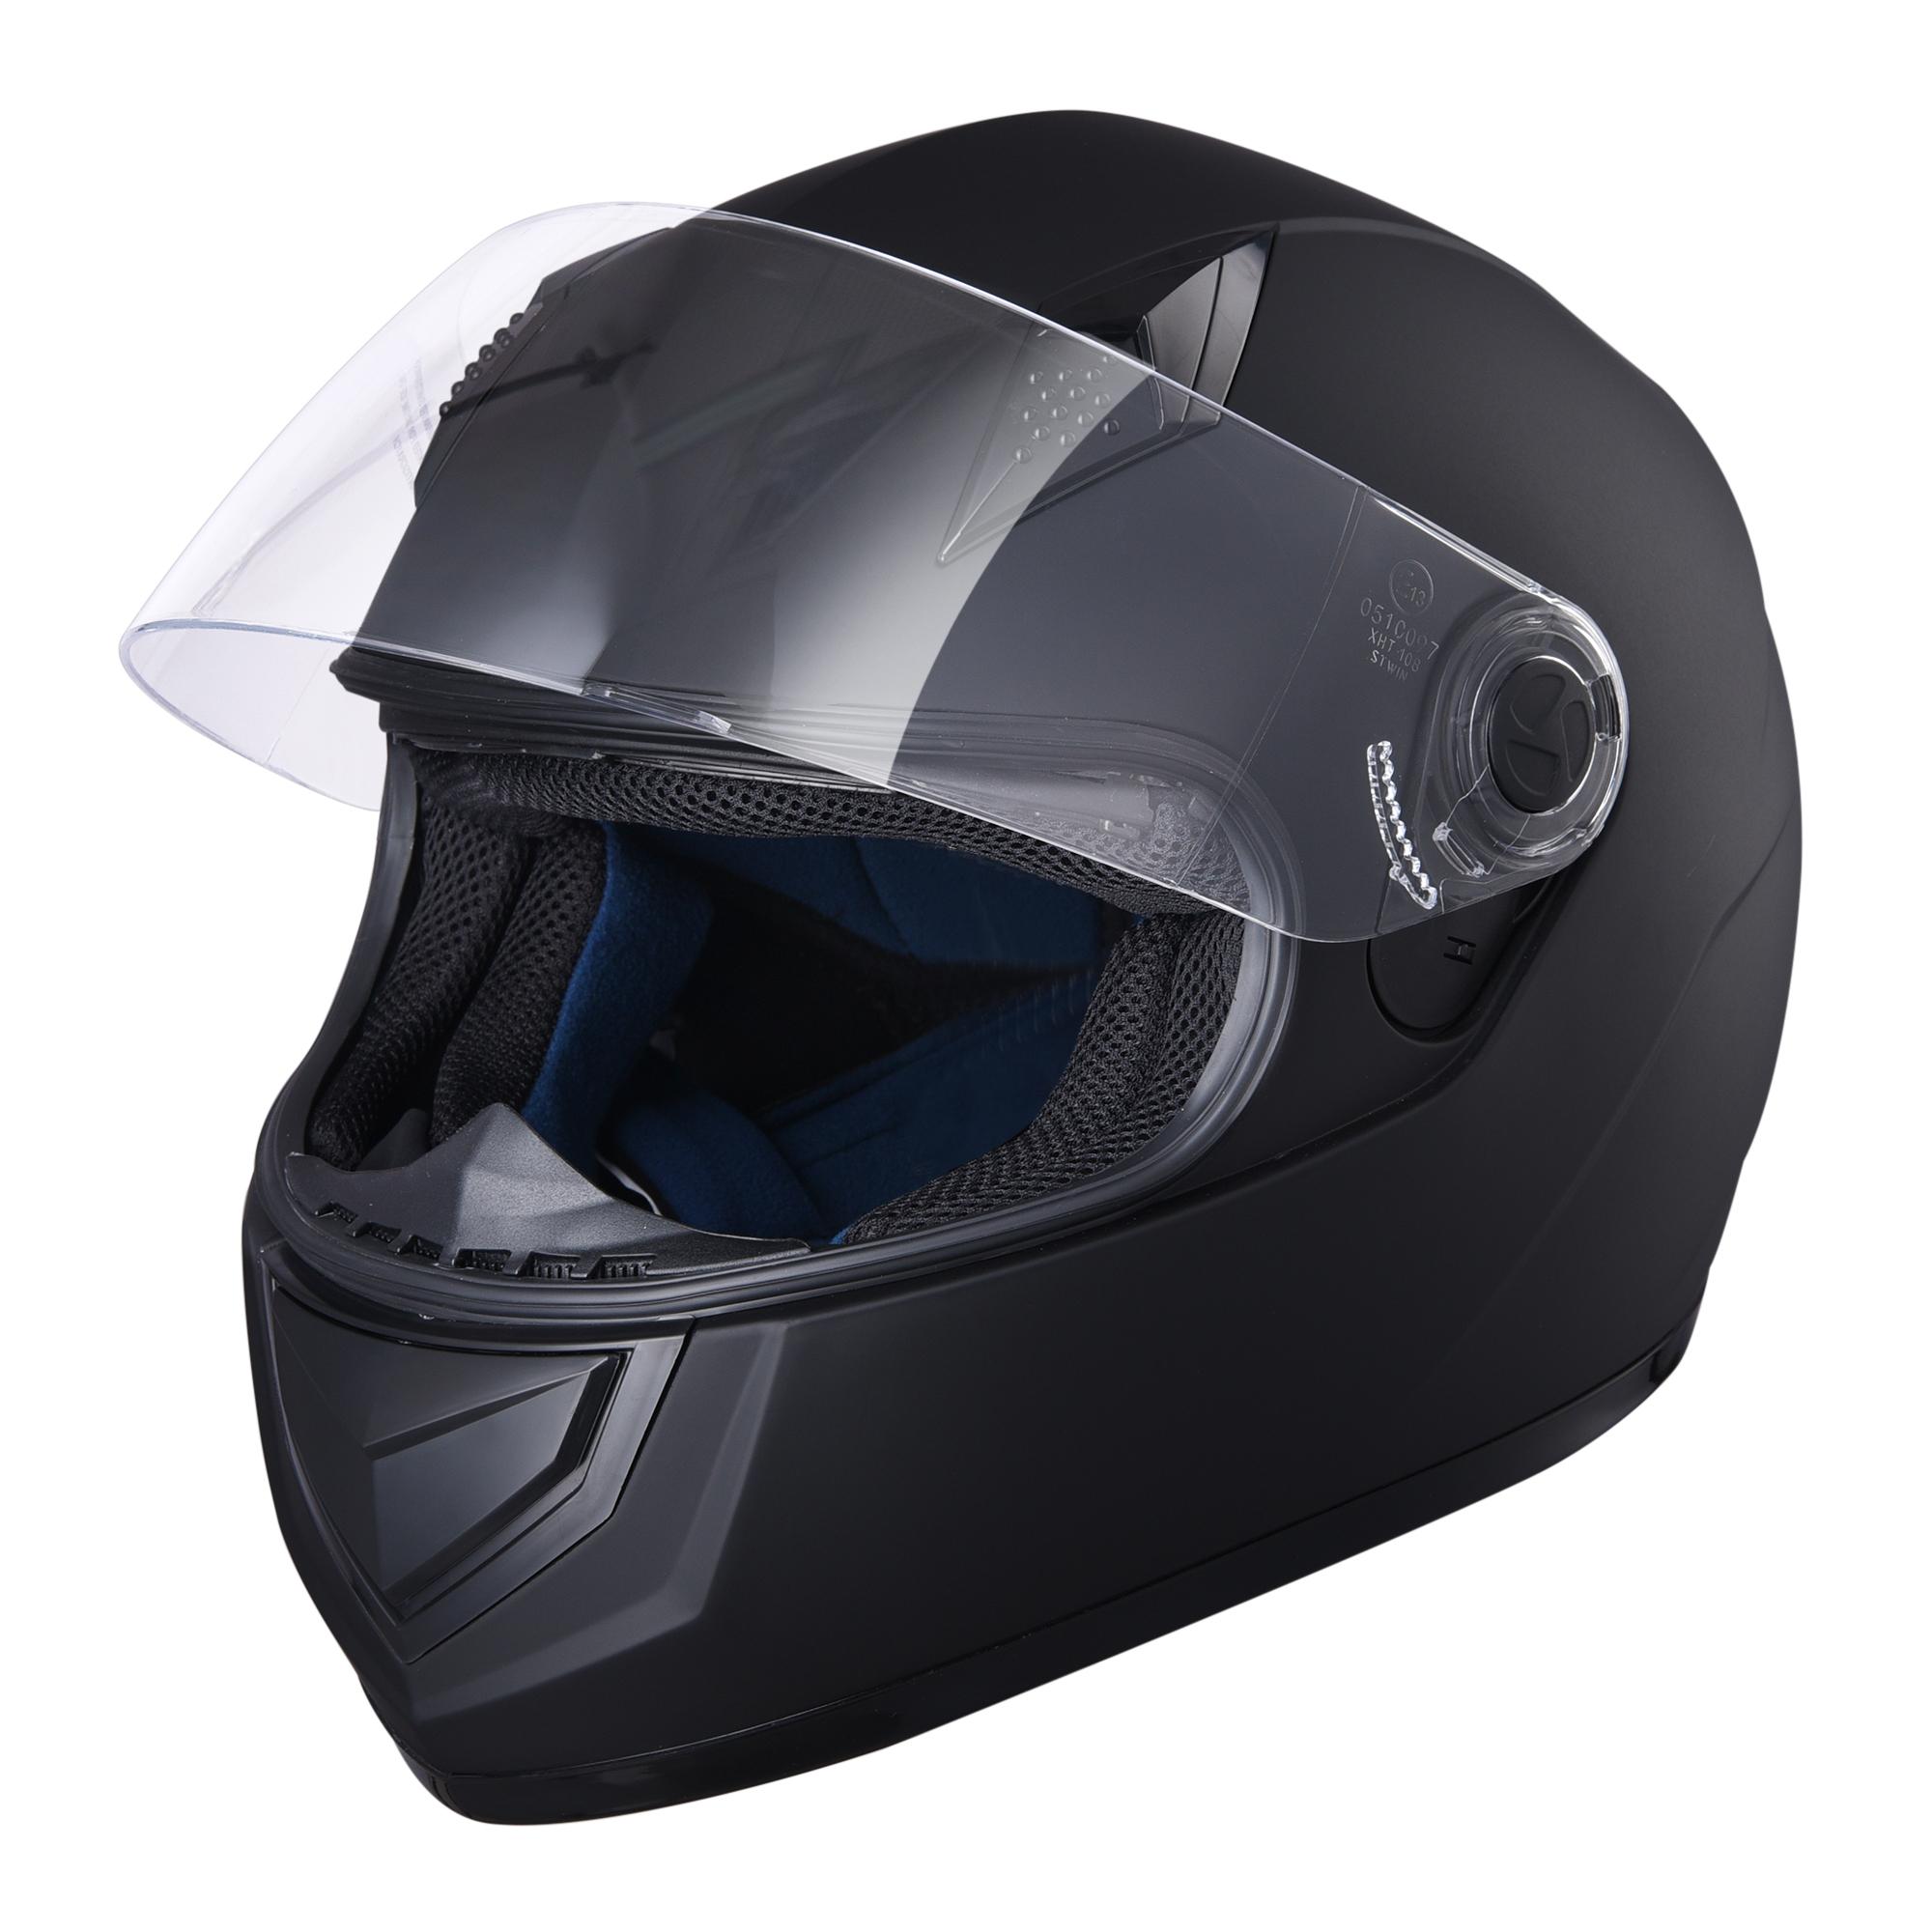 miniature 133 - AHR K12 Full Face Motorcycle Helmet DOT Air Vents Clear Visor Racing S M L XL